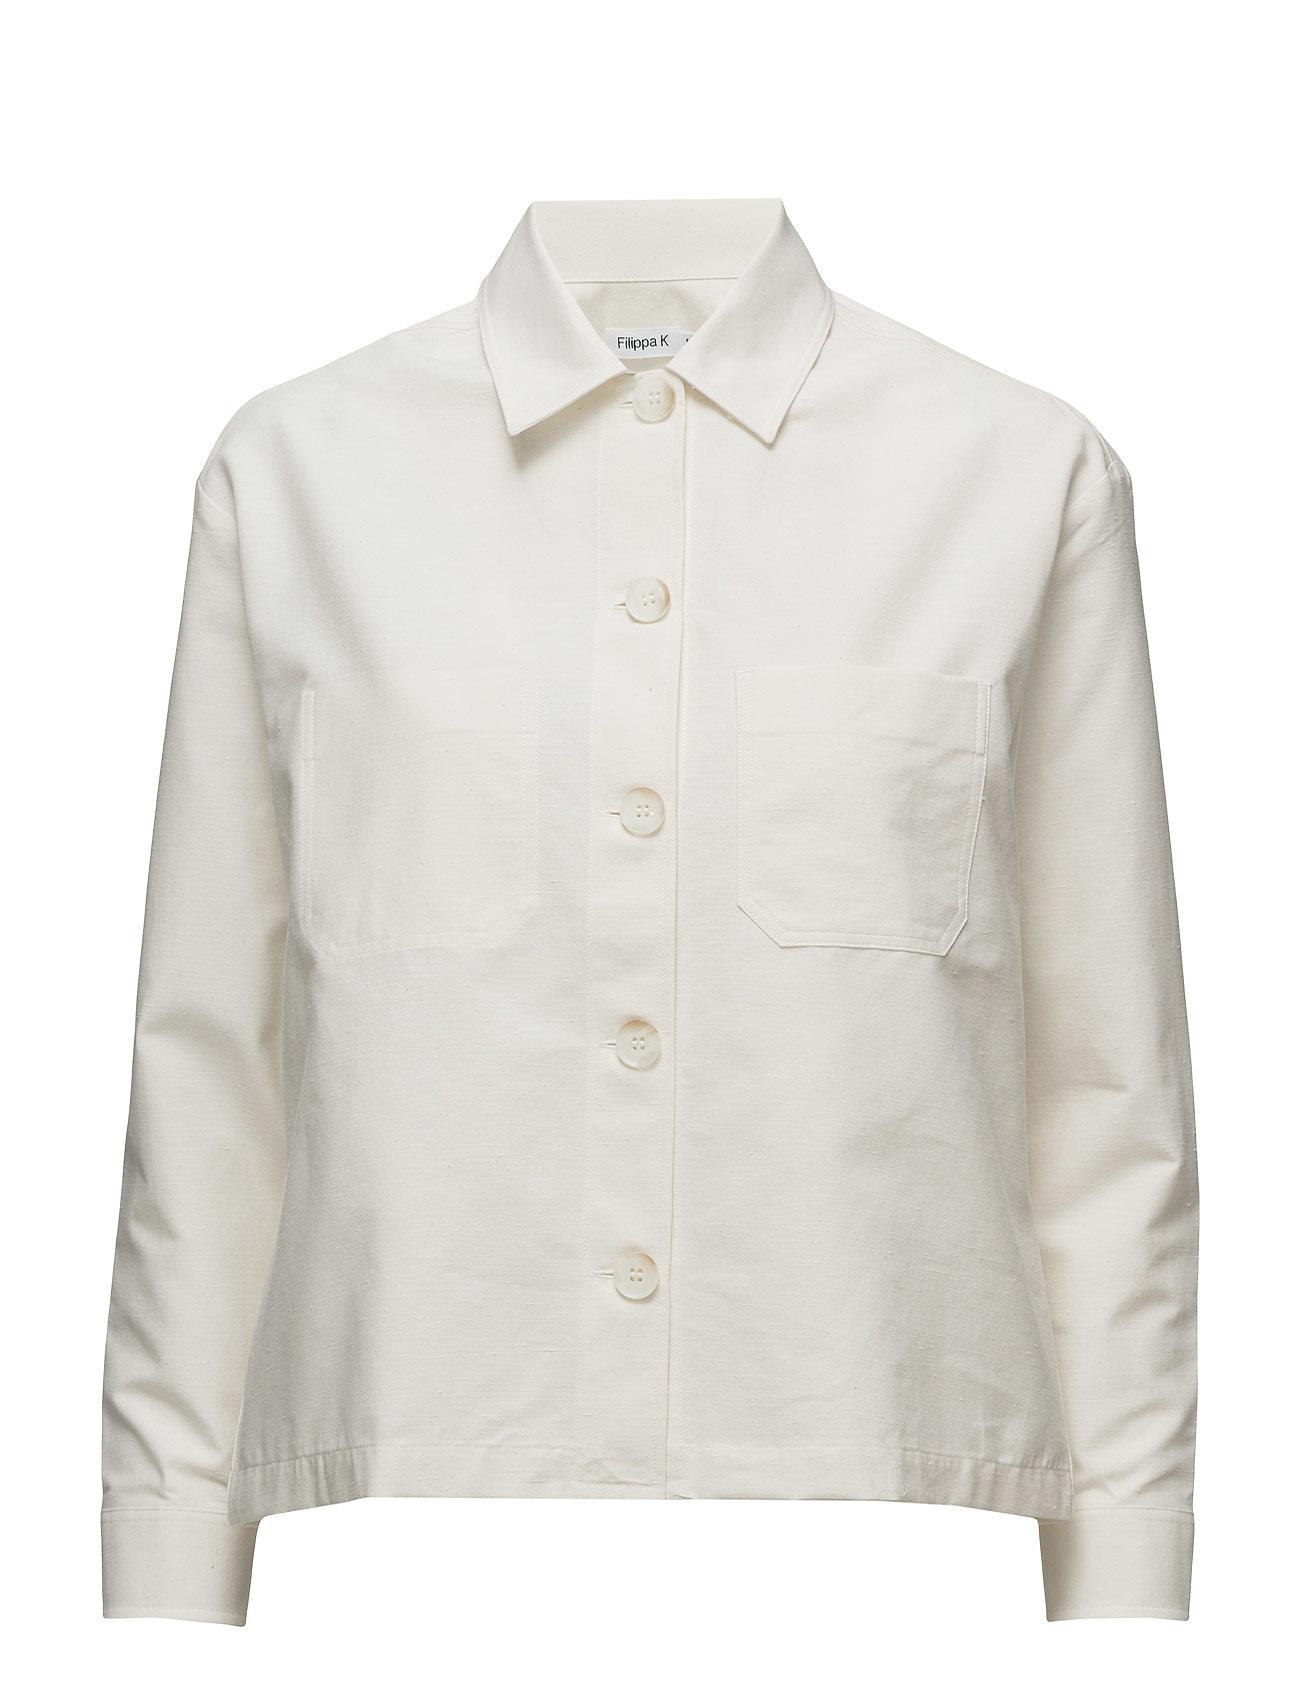 Filippa K Riely Jacket